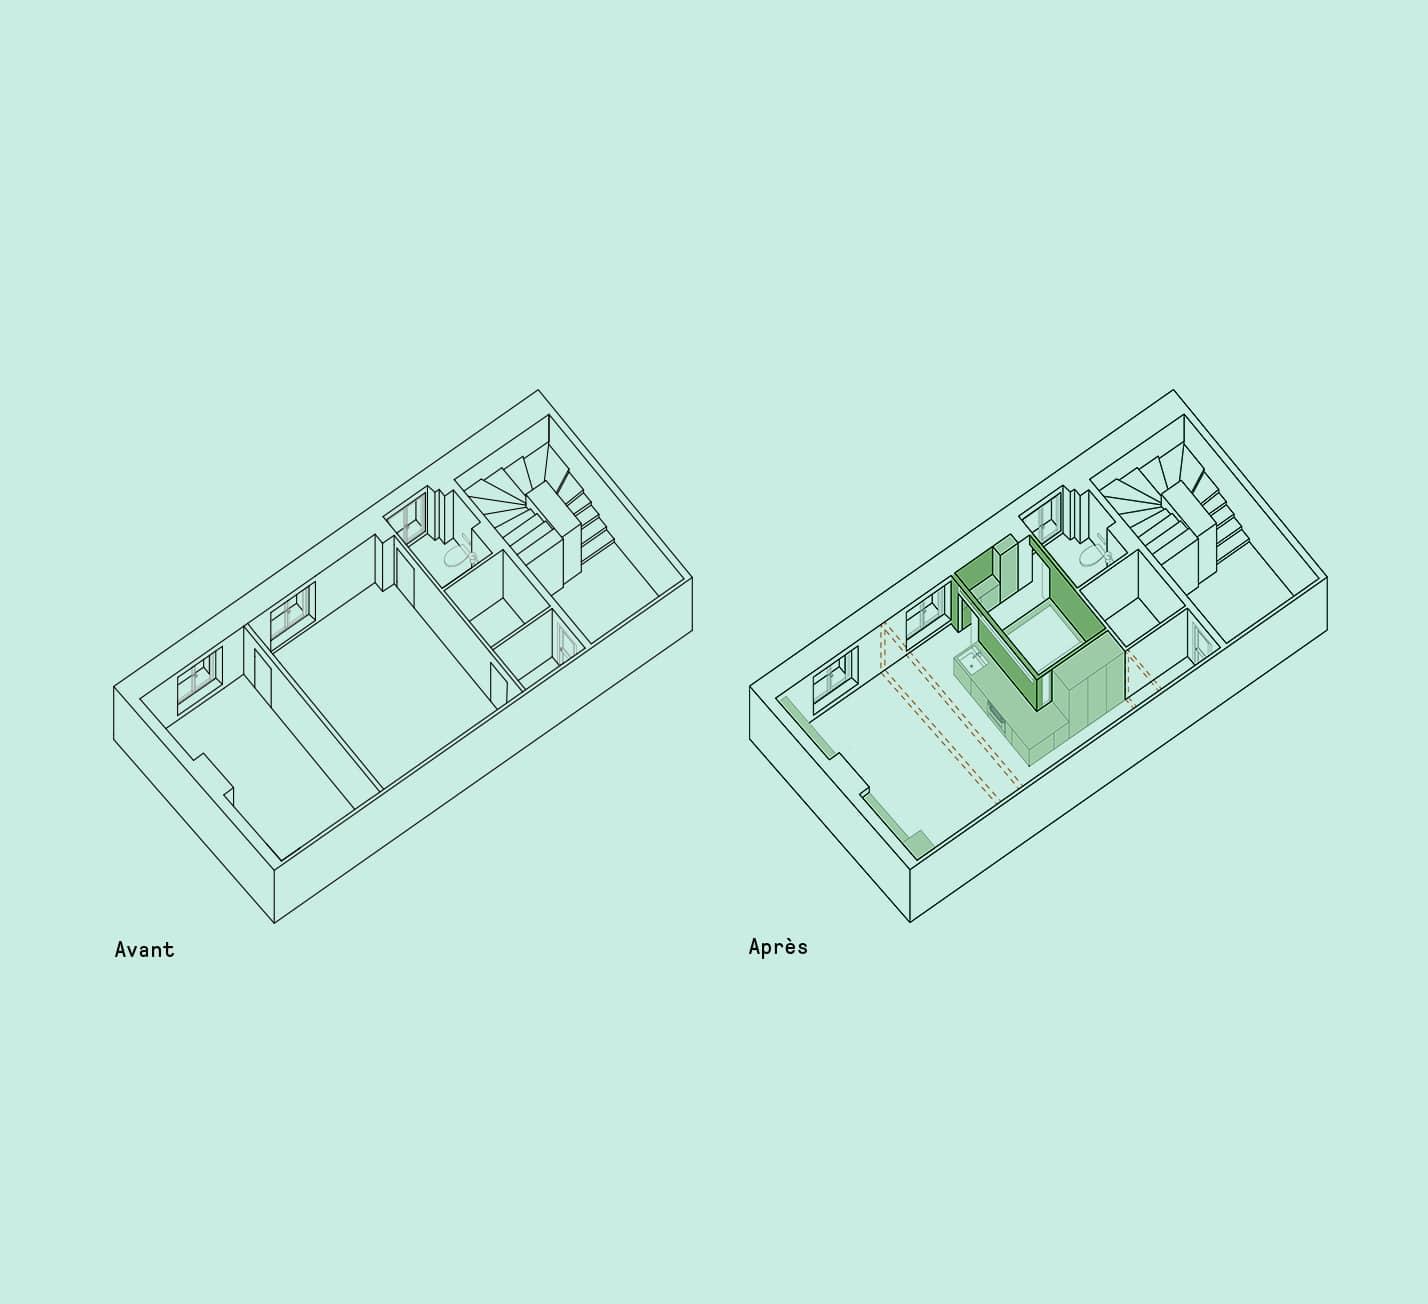 Appartement-Montmartre-Psd-dessins-01-min